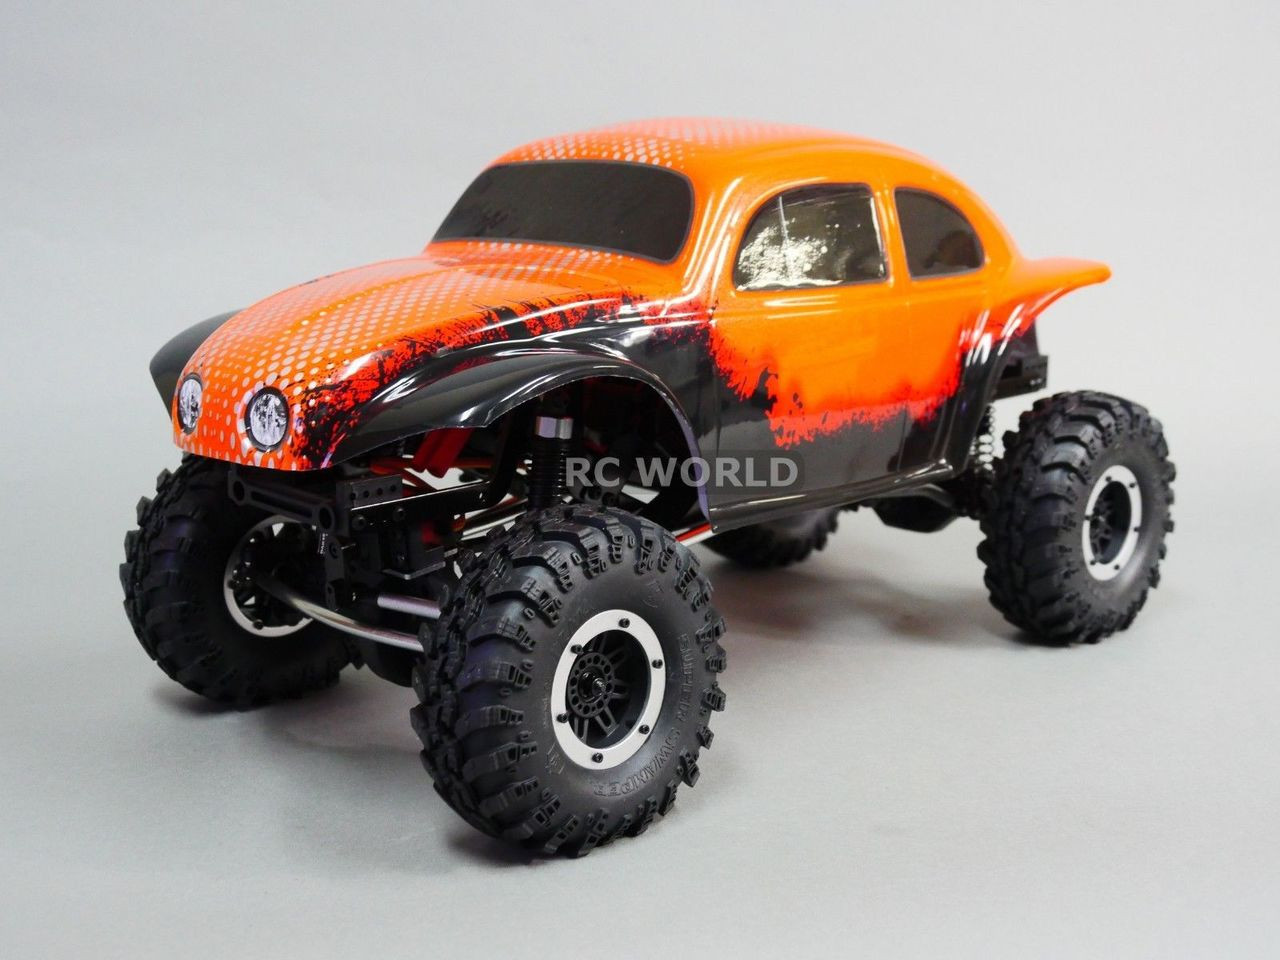 RC 1/10 Truck BODY BAJA Monster BEETLE BUG Rock Crawler 313mm -PAINTED-  ORANGE